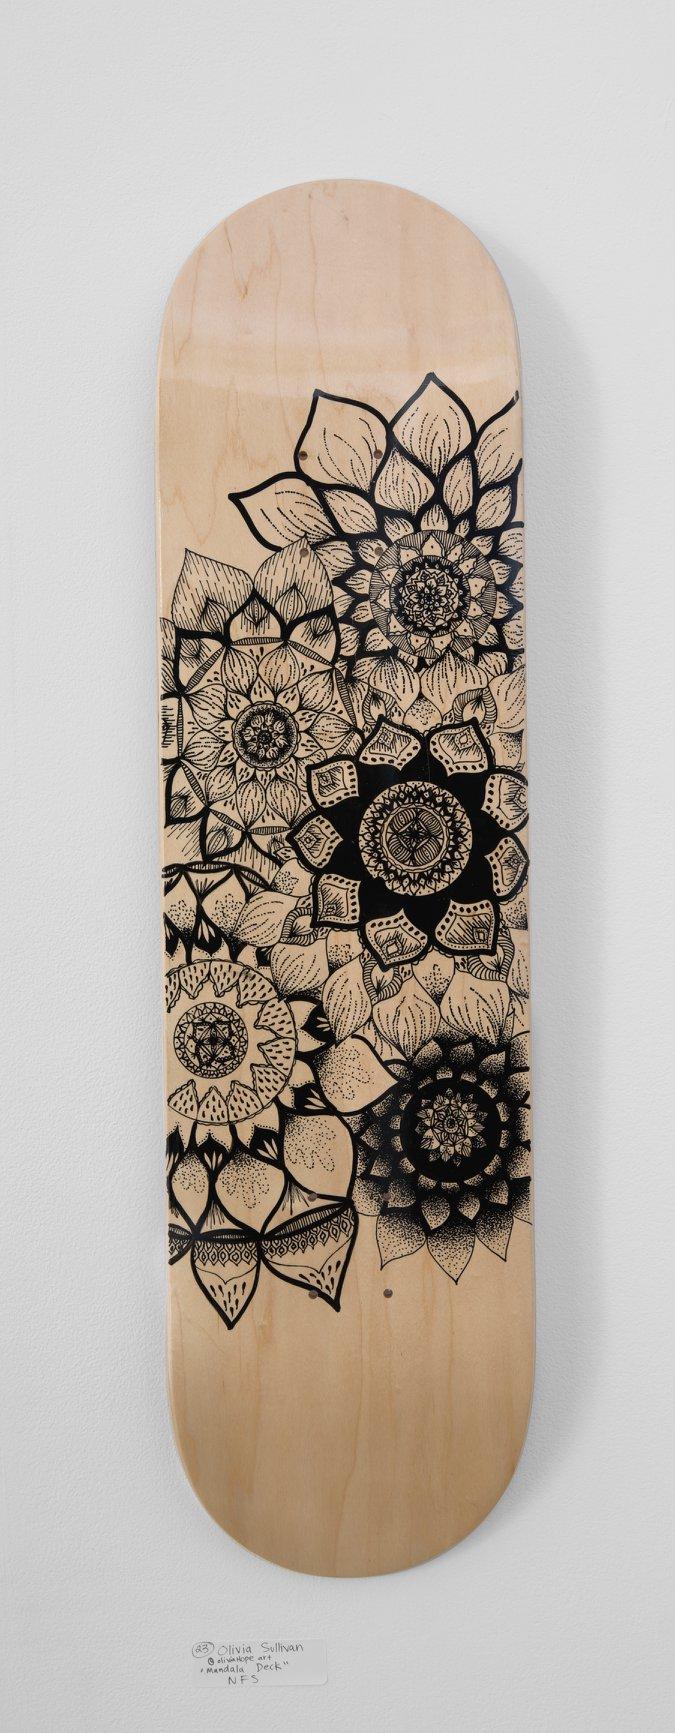 "Olivia Sullivan - ""Mandala Deck"" Insta: @OliviaHopeArt  Not For Sale"